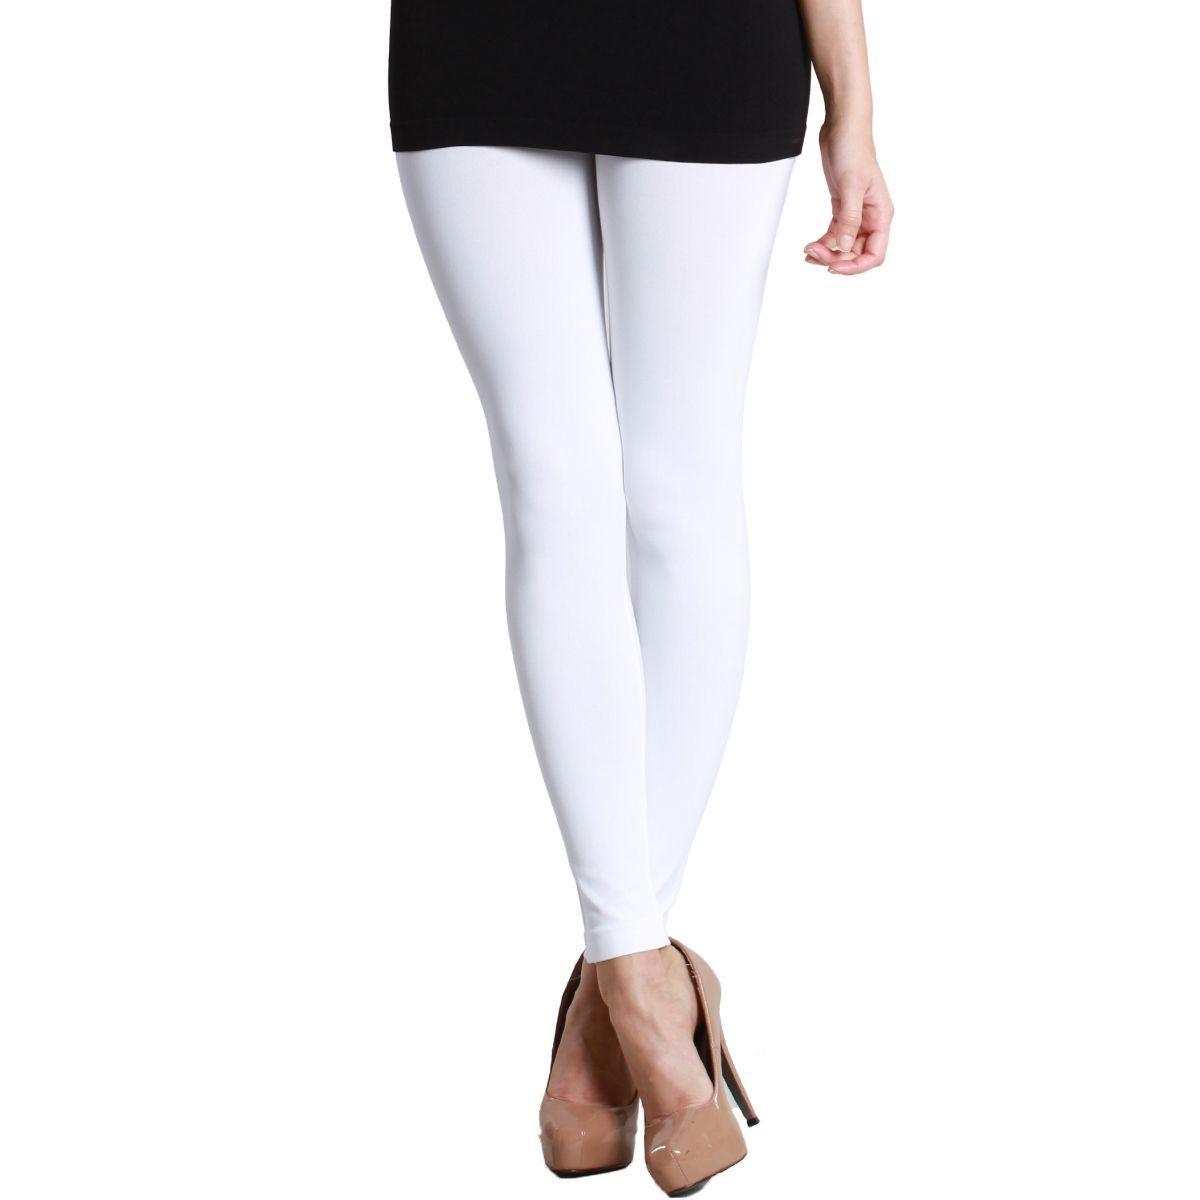 075d8cd5ca7c87 Nikibiki Women's Plain Ankle Length Leggings | Products | Ankle ...